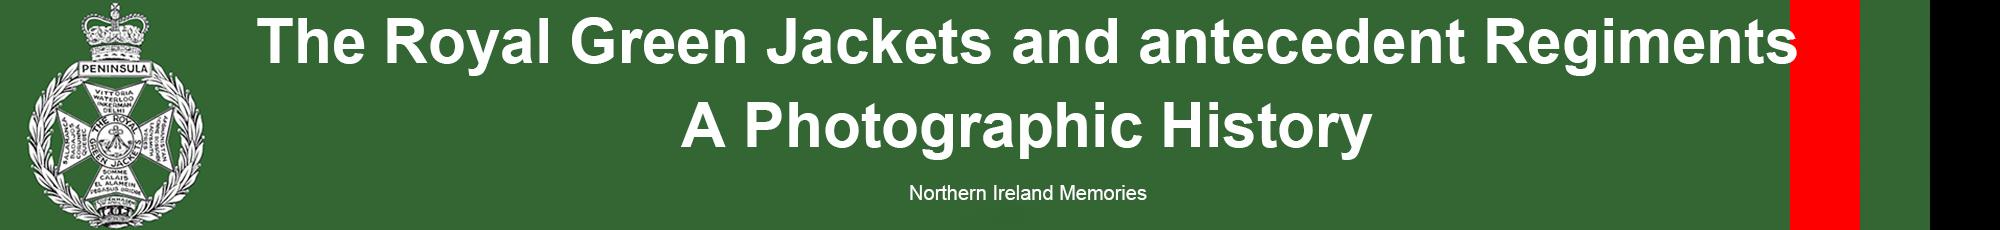 Memories Of Northern Ireland 2008 Ken Wharton Royal border=